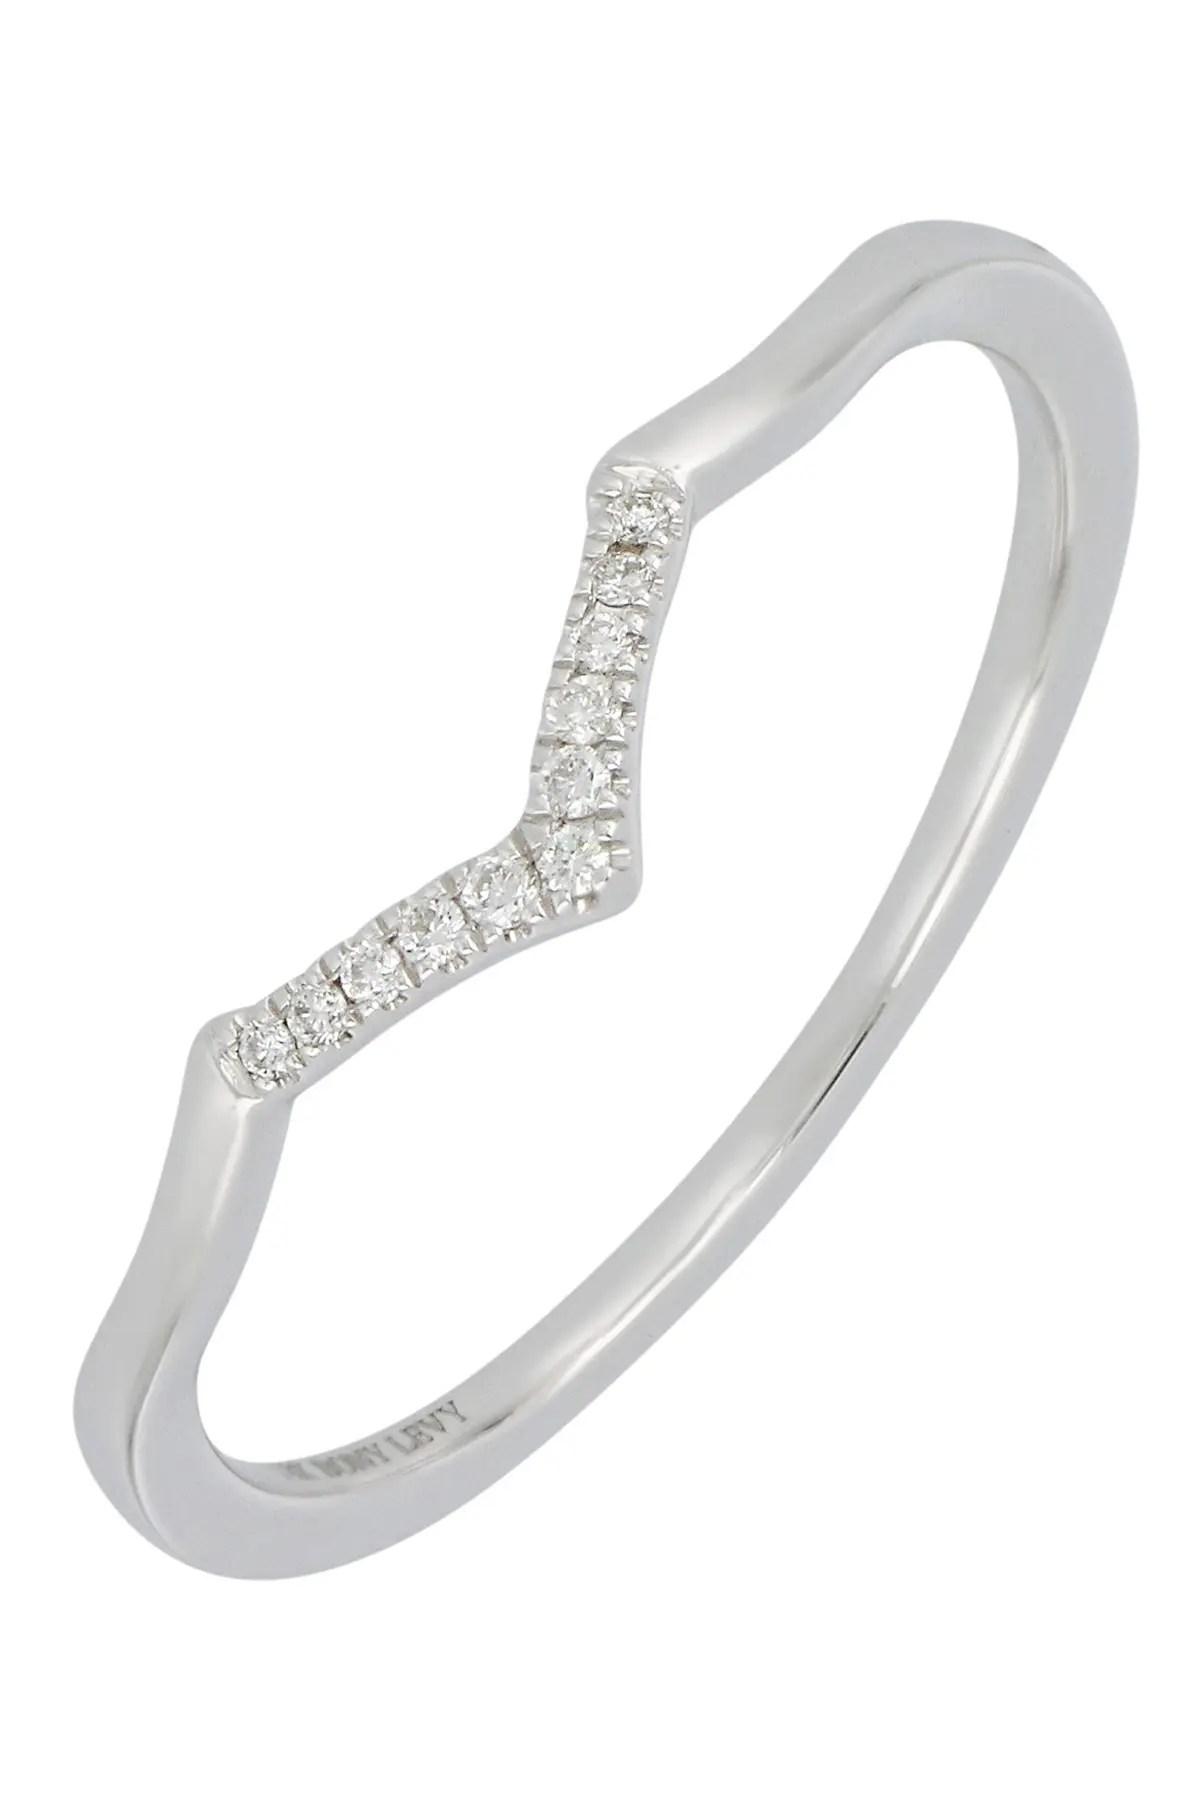 bony levy 18k white gold pave diamond v shape ring 0 04 ctw nordstrom rack